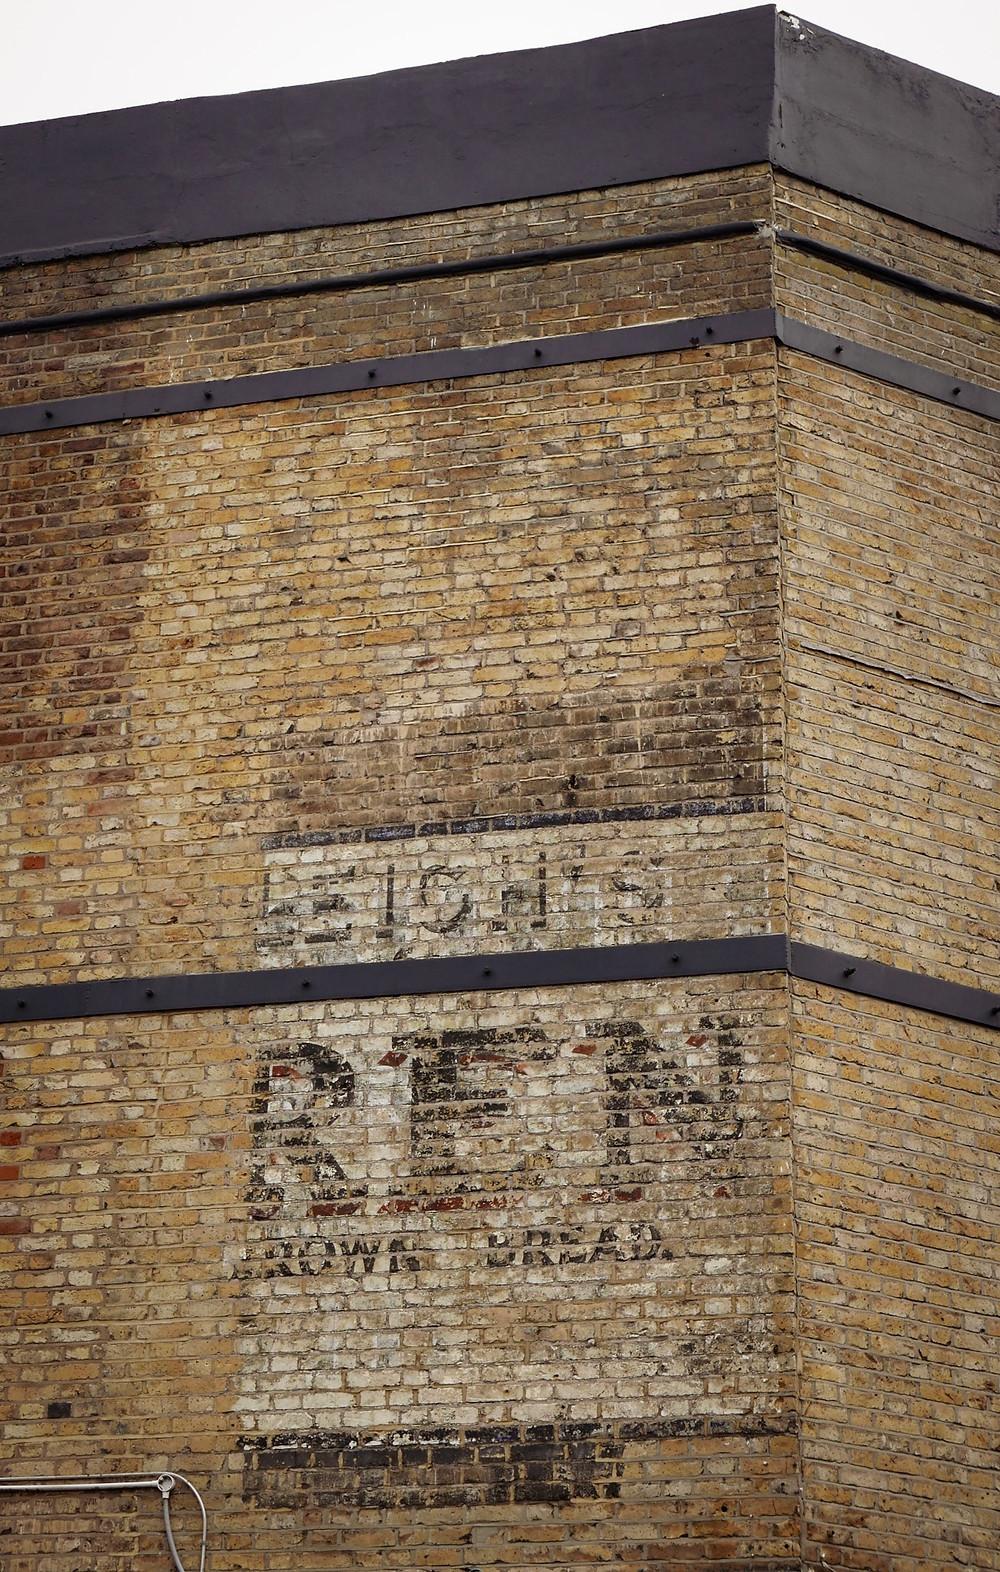 Ghostsign, advertising, history, Stoke Newington